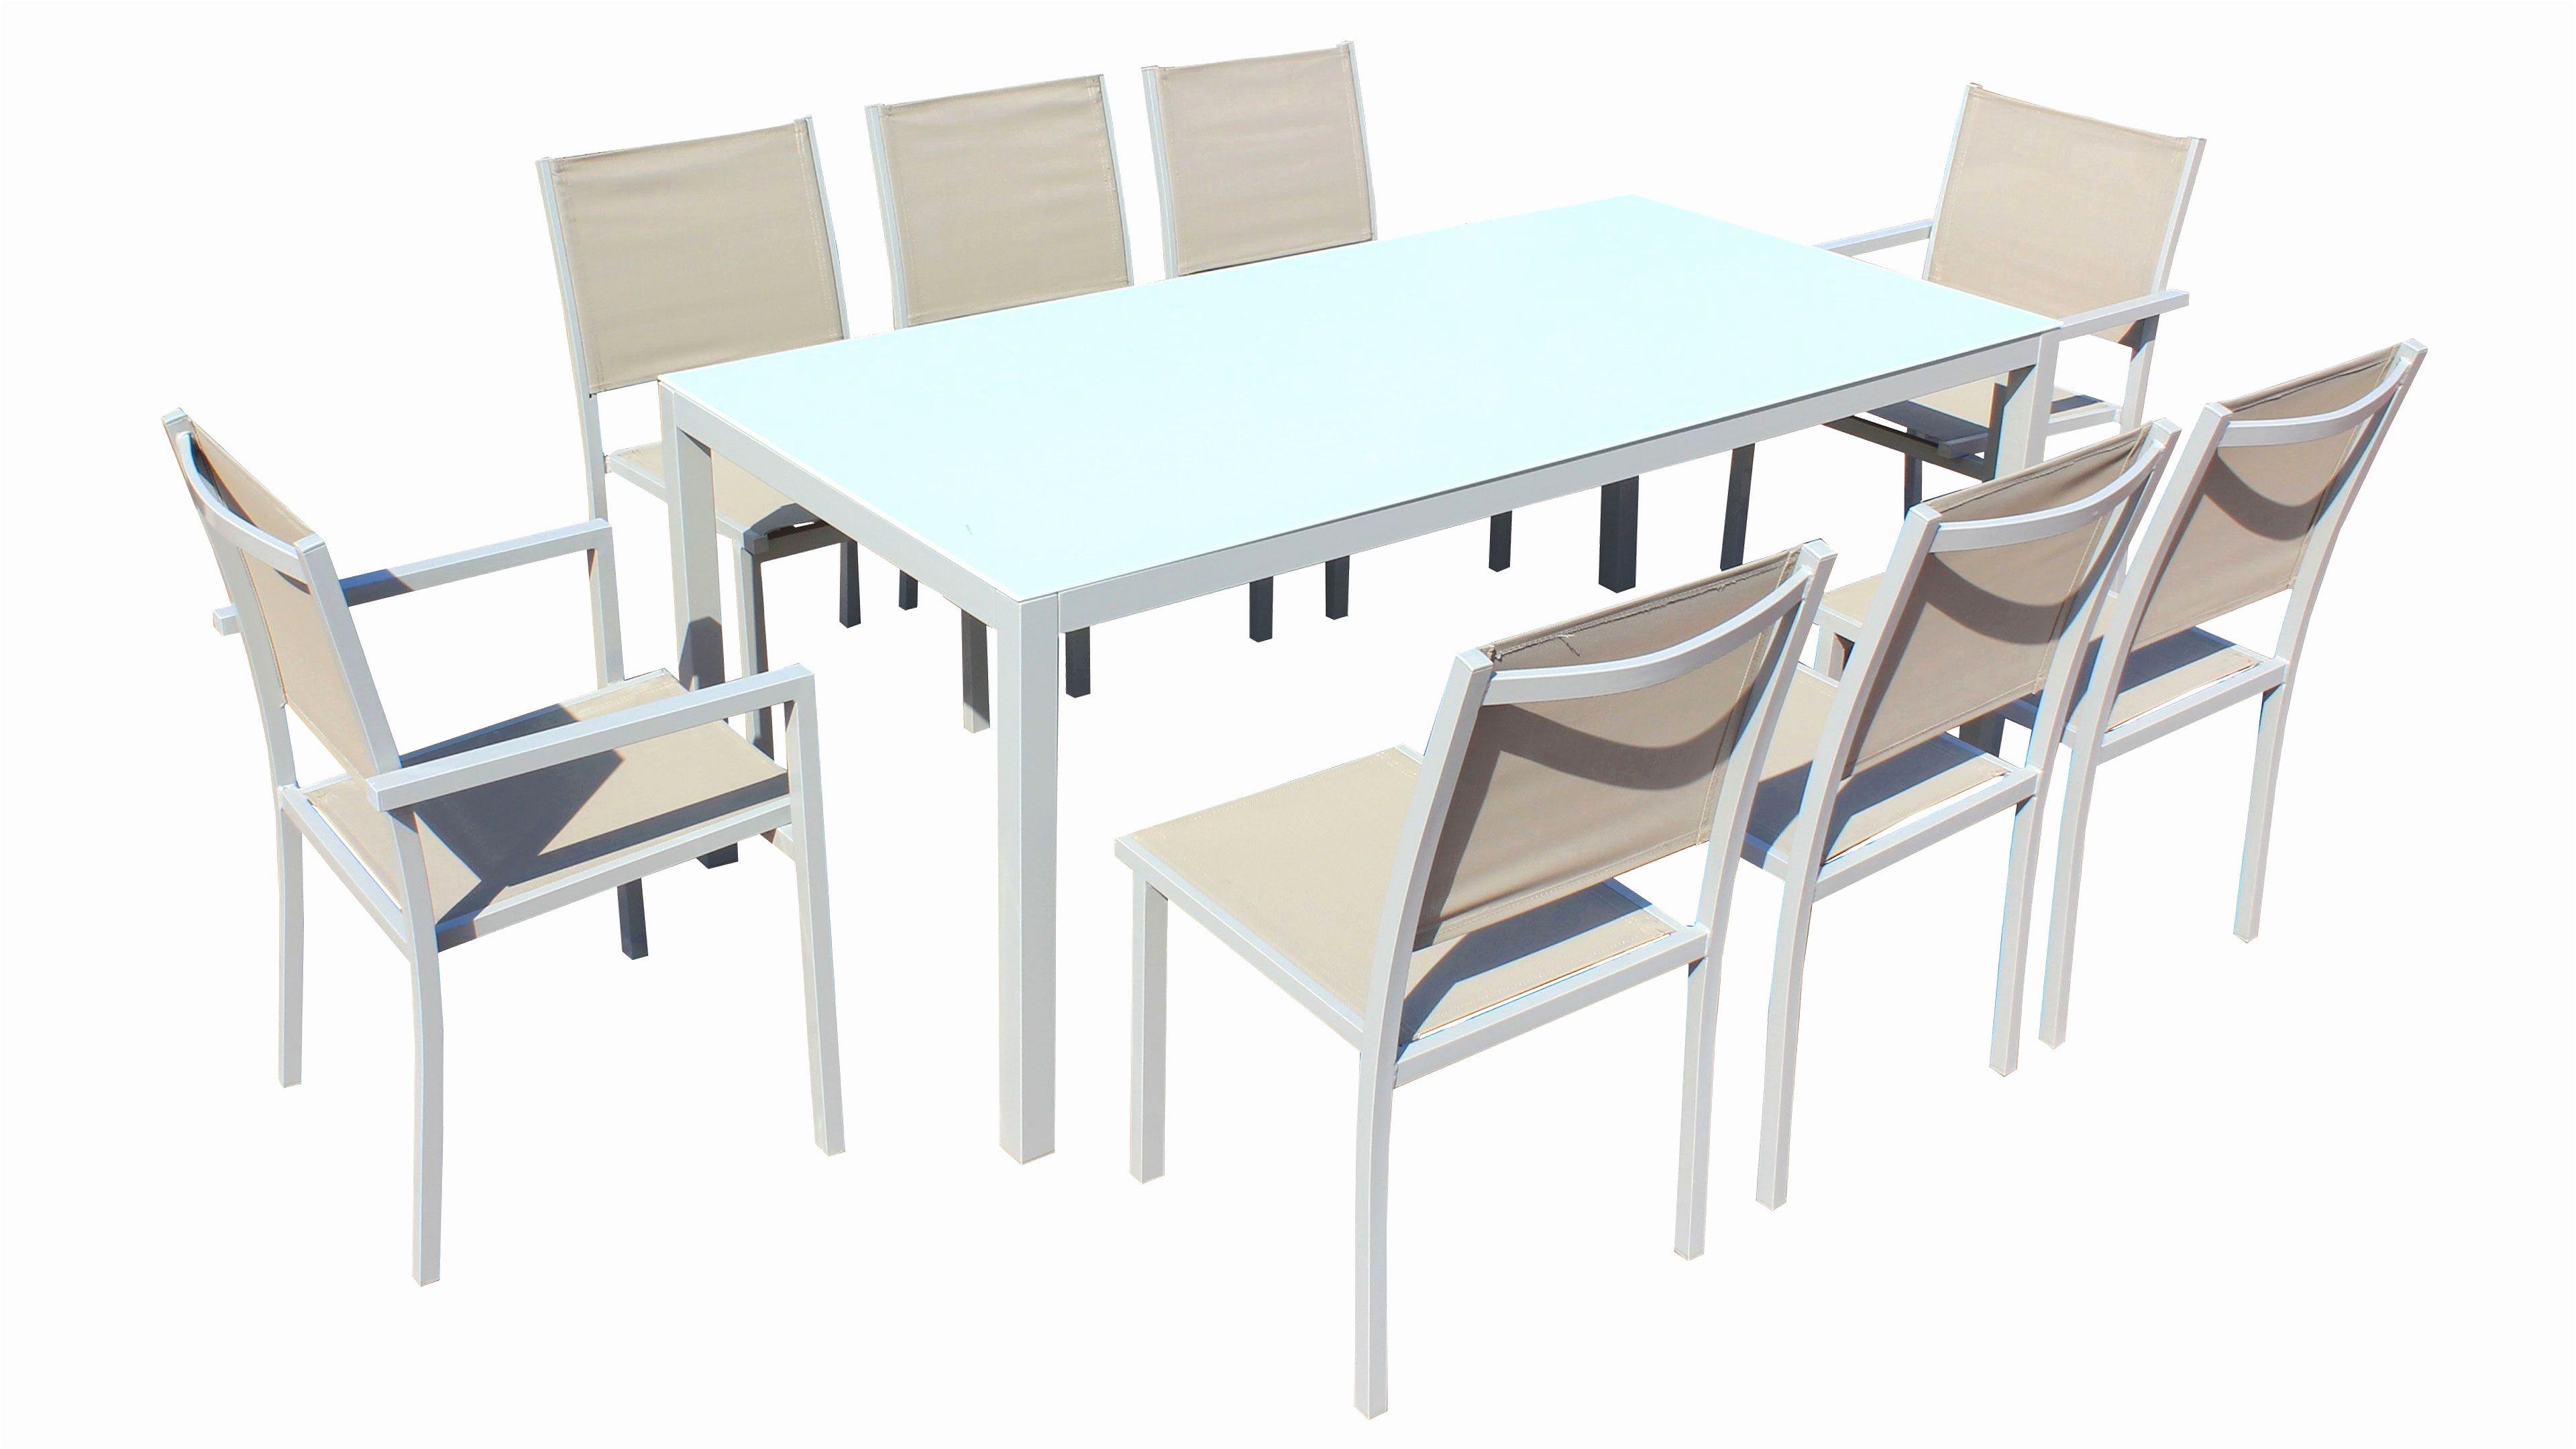 Chaise Alinea Cuisine Charmant Adorable Table De Cuisine Plus Chaises Dans Chaise Table Chaise Alineatable